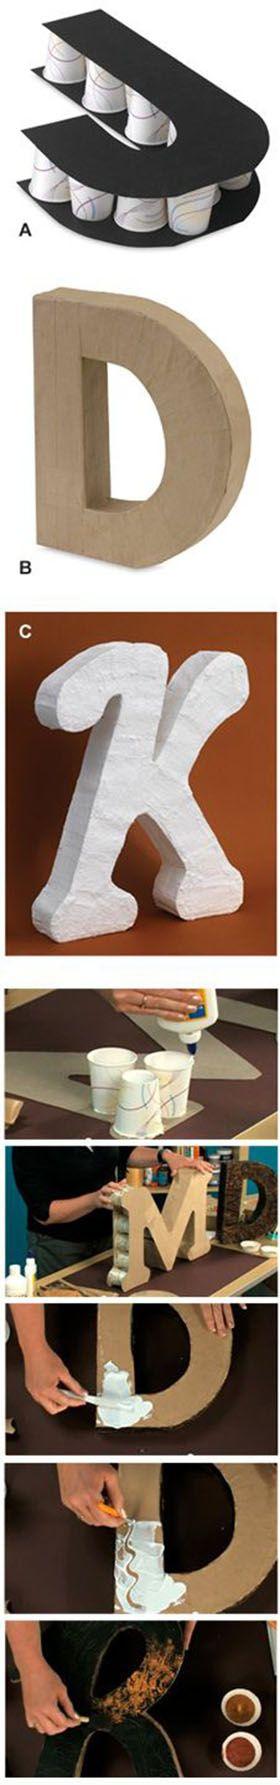 Cool Letter Craft | DIY & Crafts Tutorials